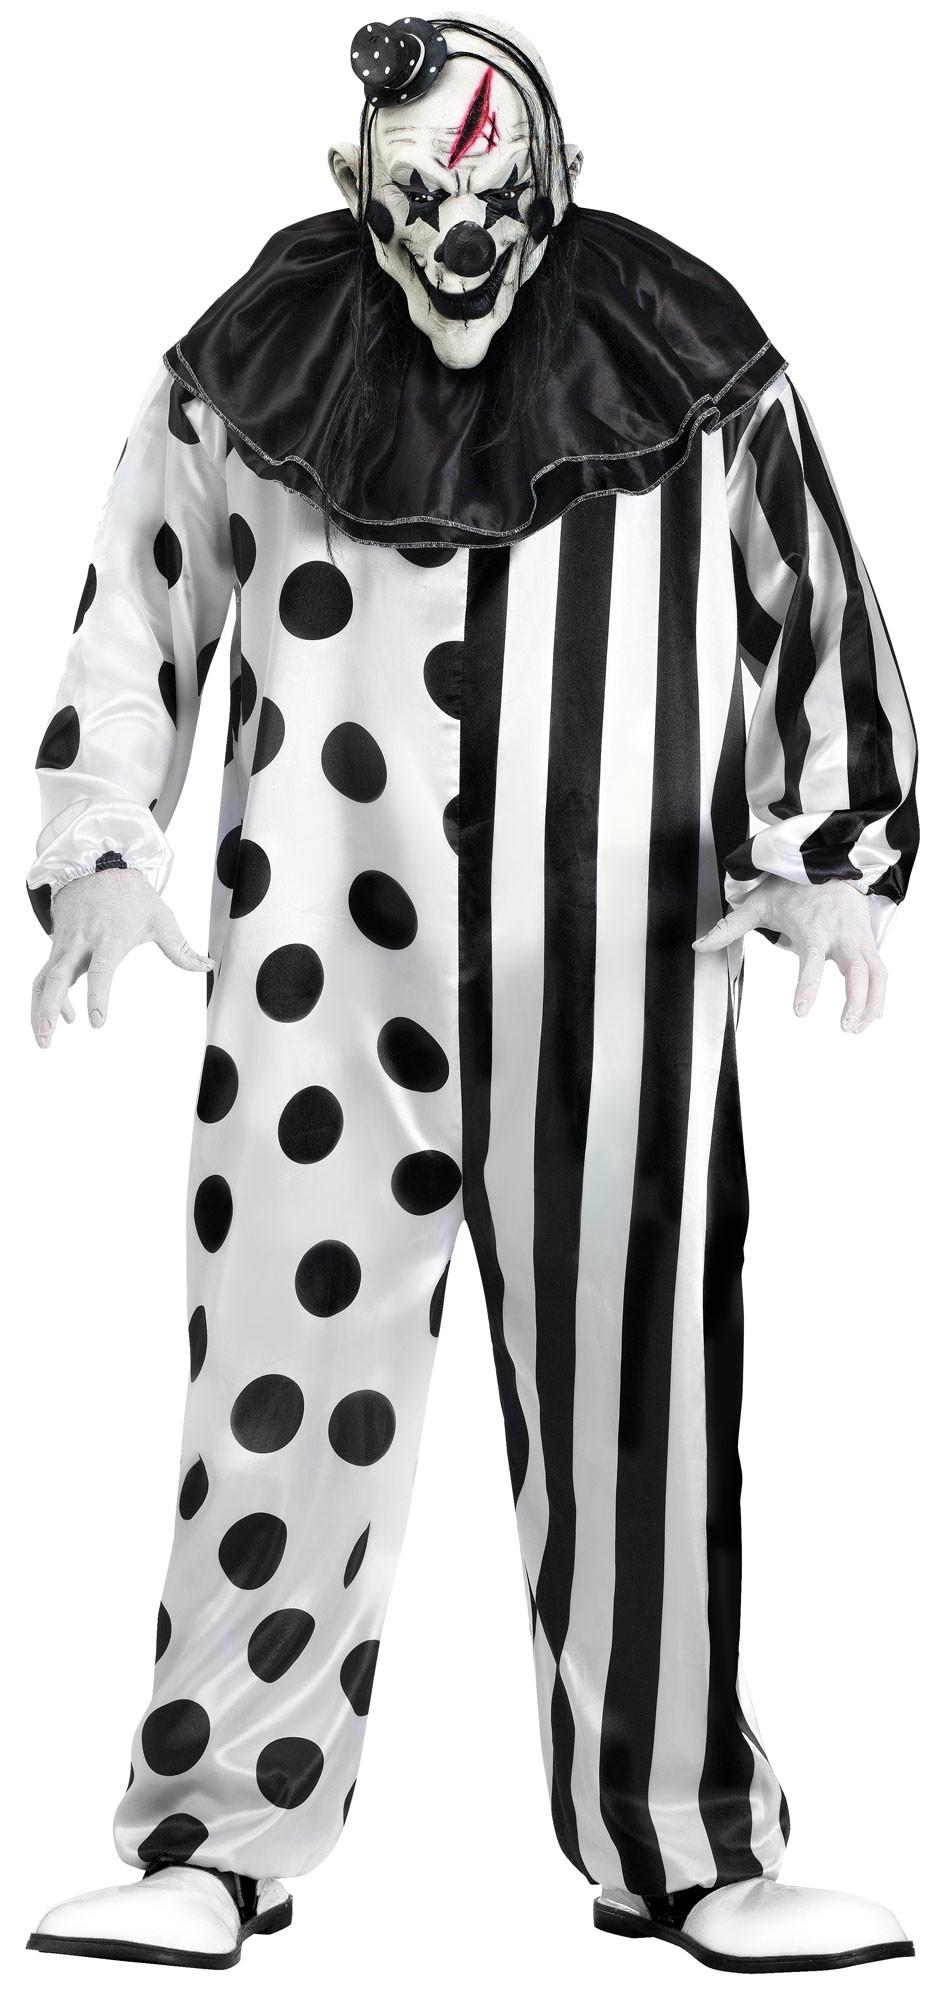 Adults Killer Clown Costume  sc 1 st  Mega Fancy Dress & Adults Killer Clown Costume | Mens Halloween Costumes | Mega Fancy Dress